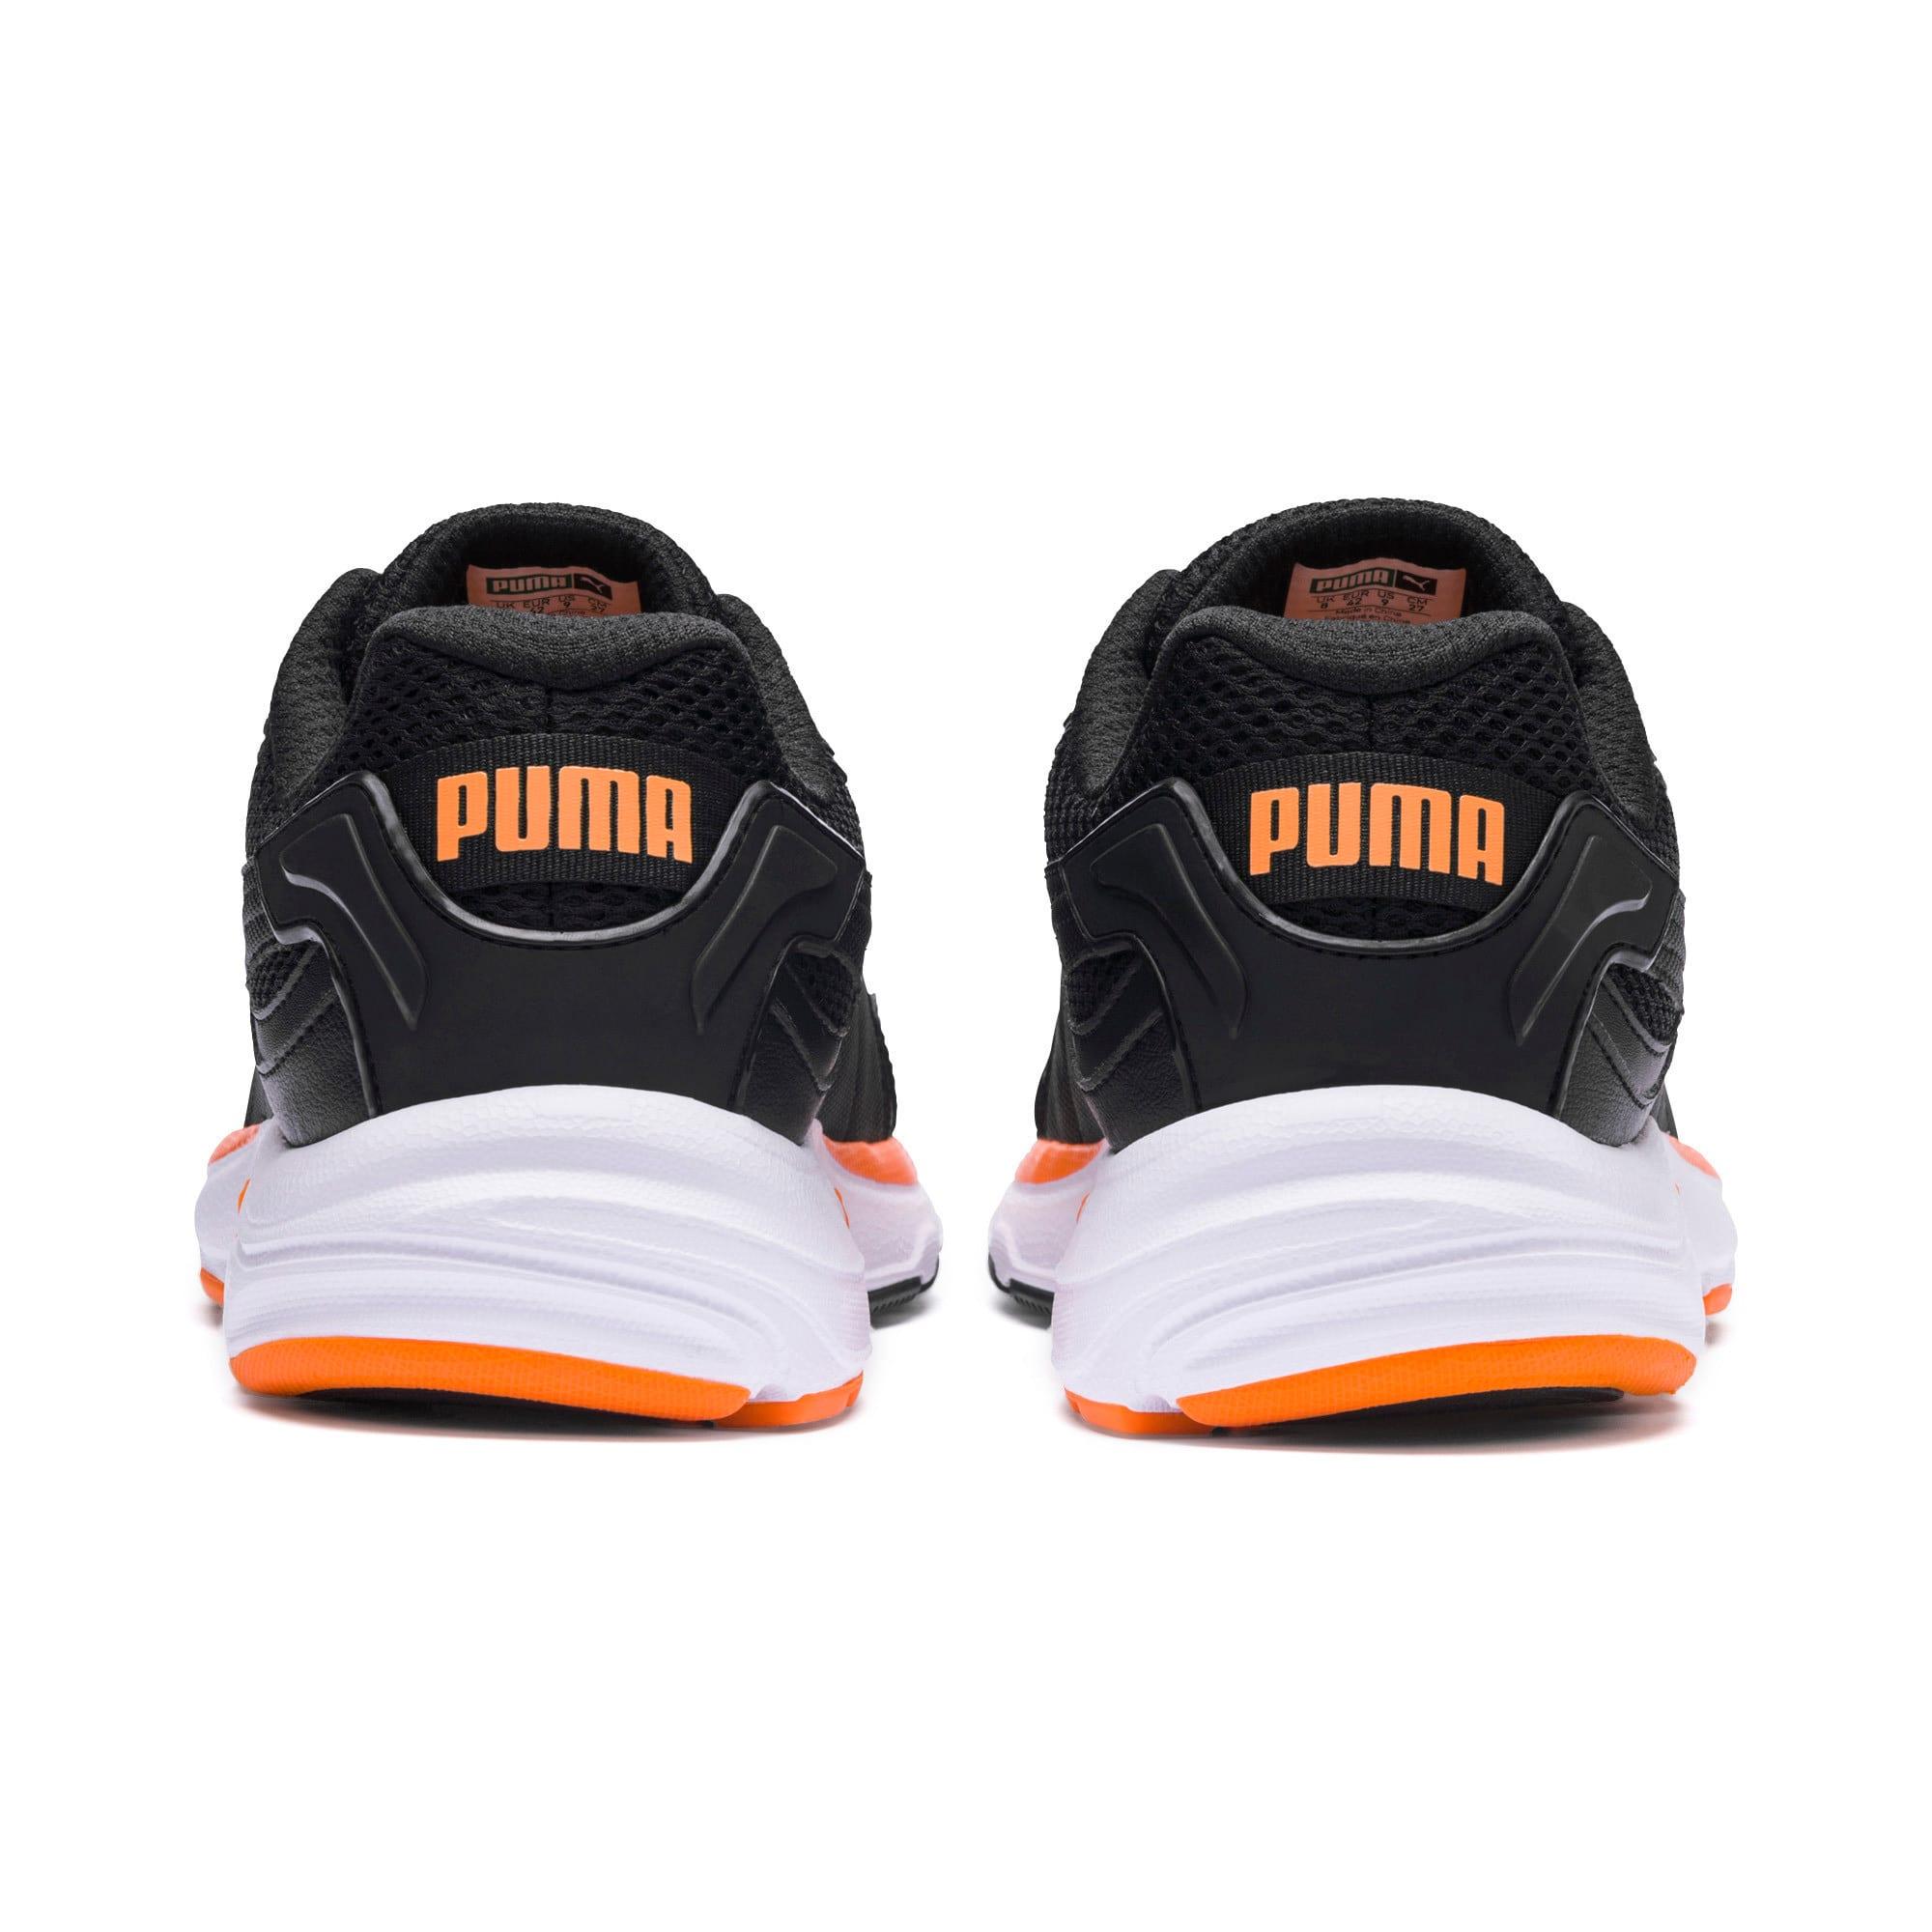 Thumbnail 3 of Axis Plus 90s Sneakers, Puma Black-Puma Black, medium